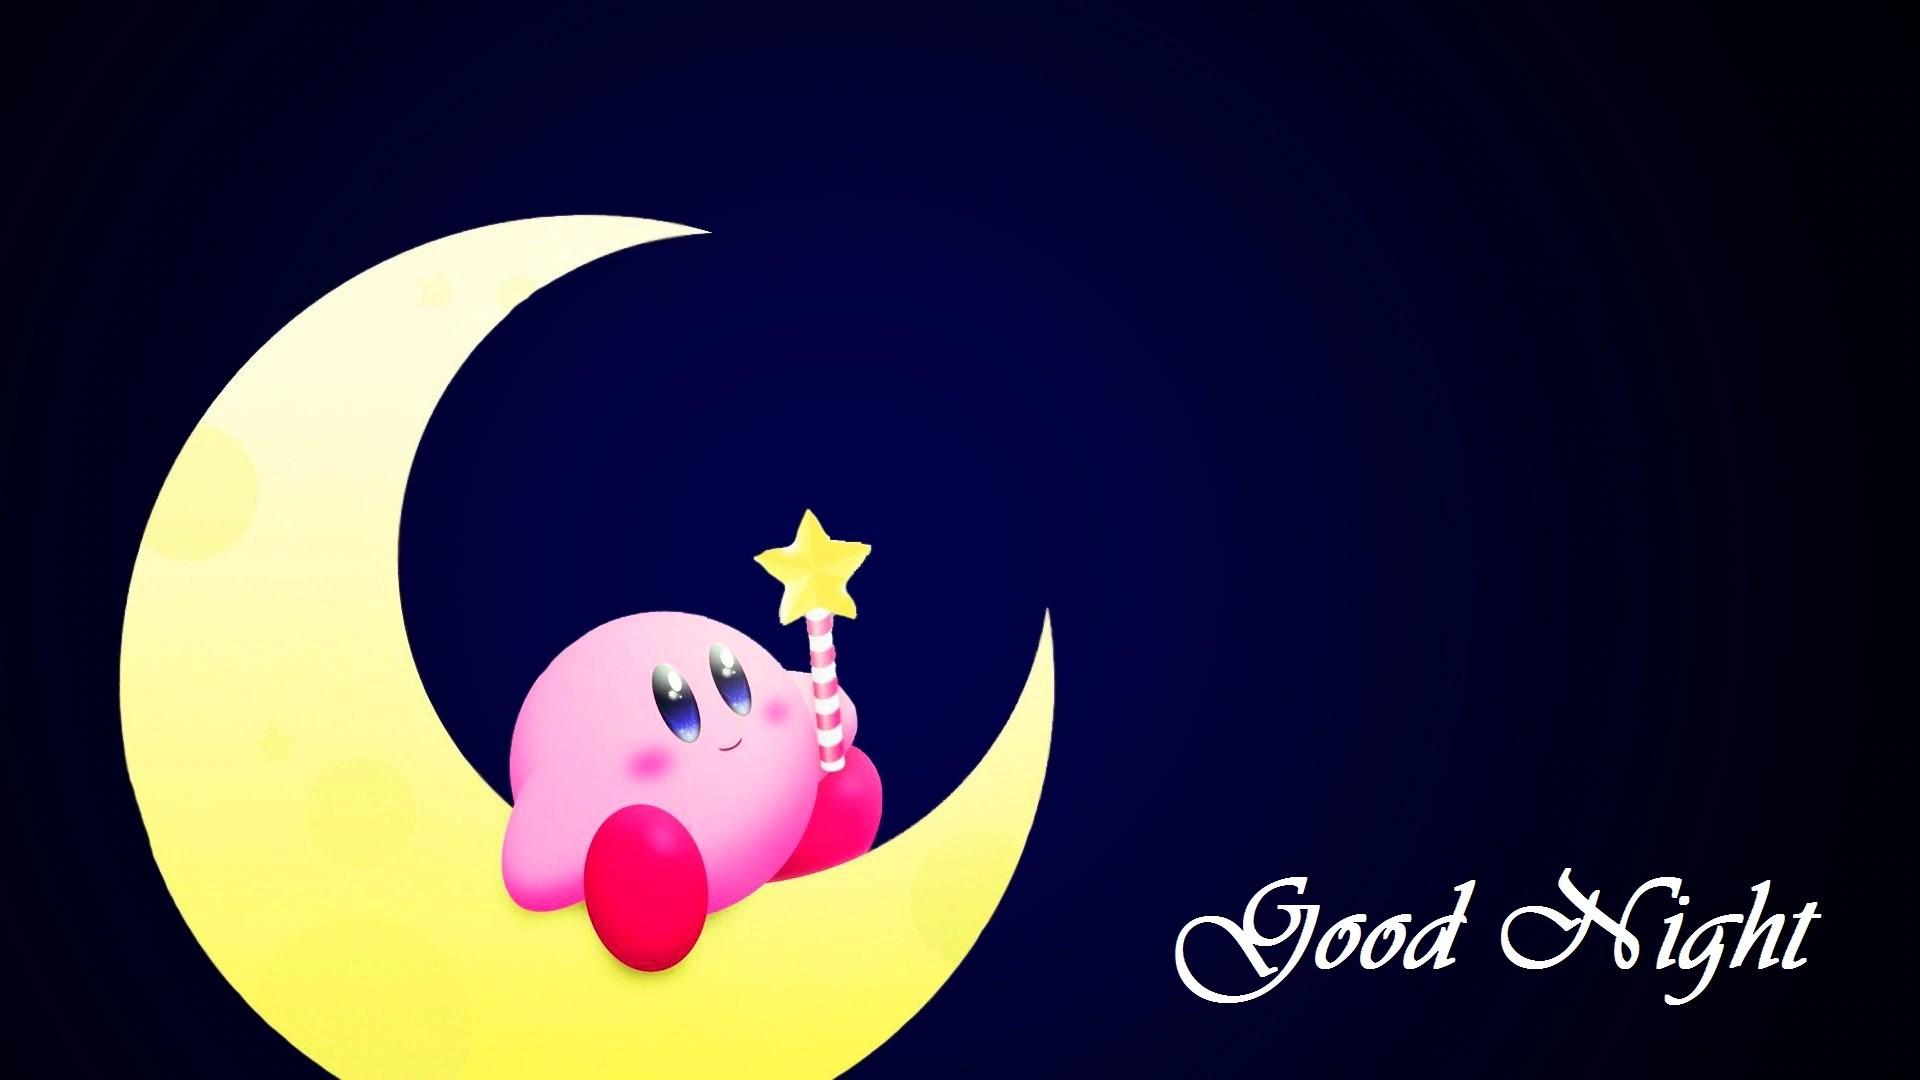 Good night full photo